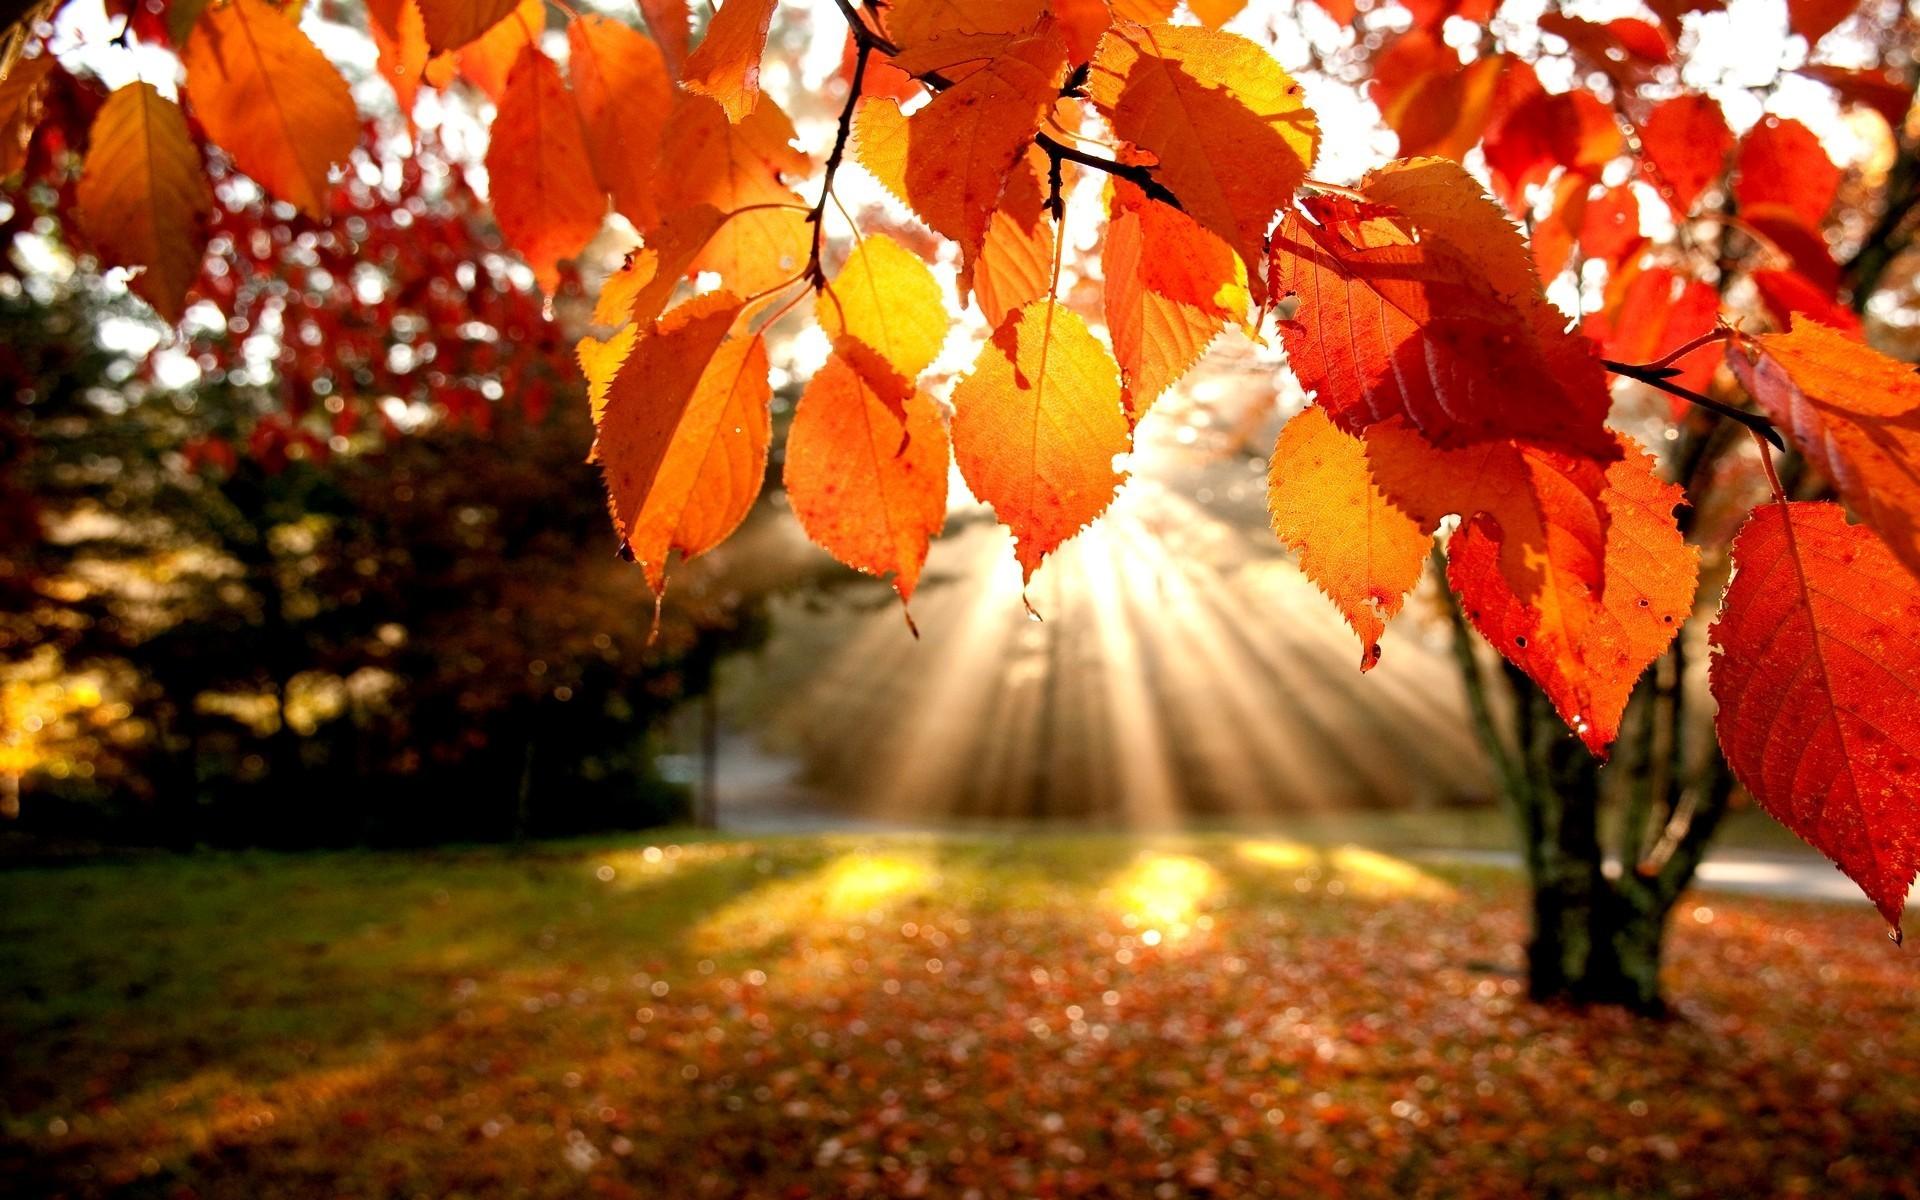 Fall Foliage Desktop Wallpaper - WallpaperSafari